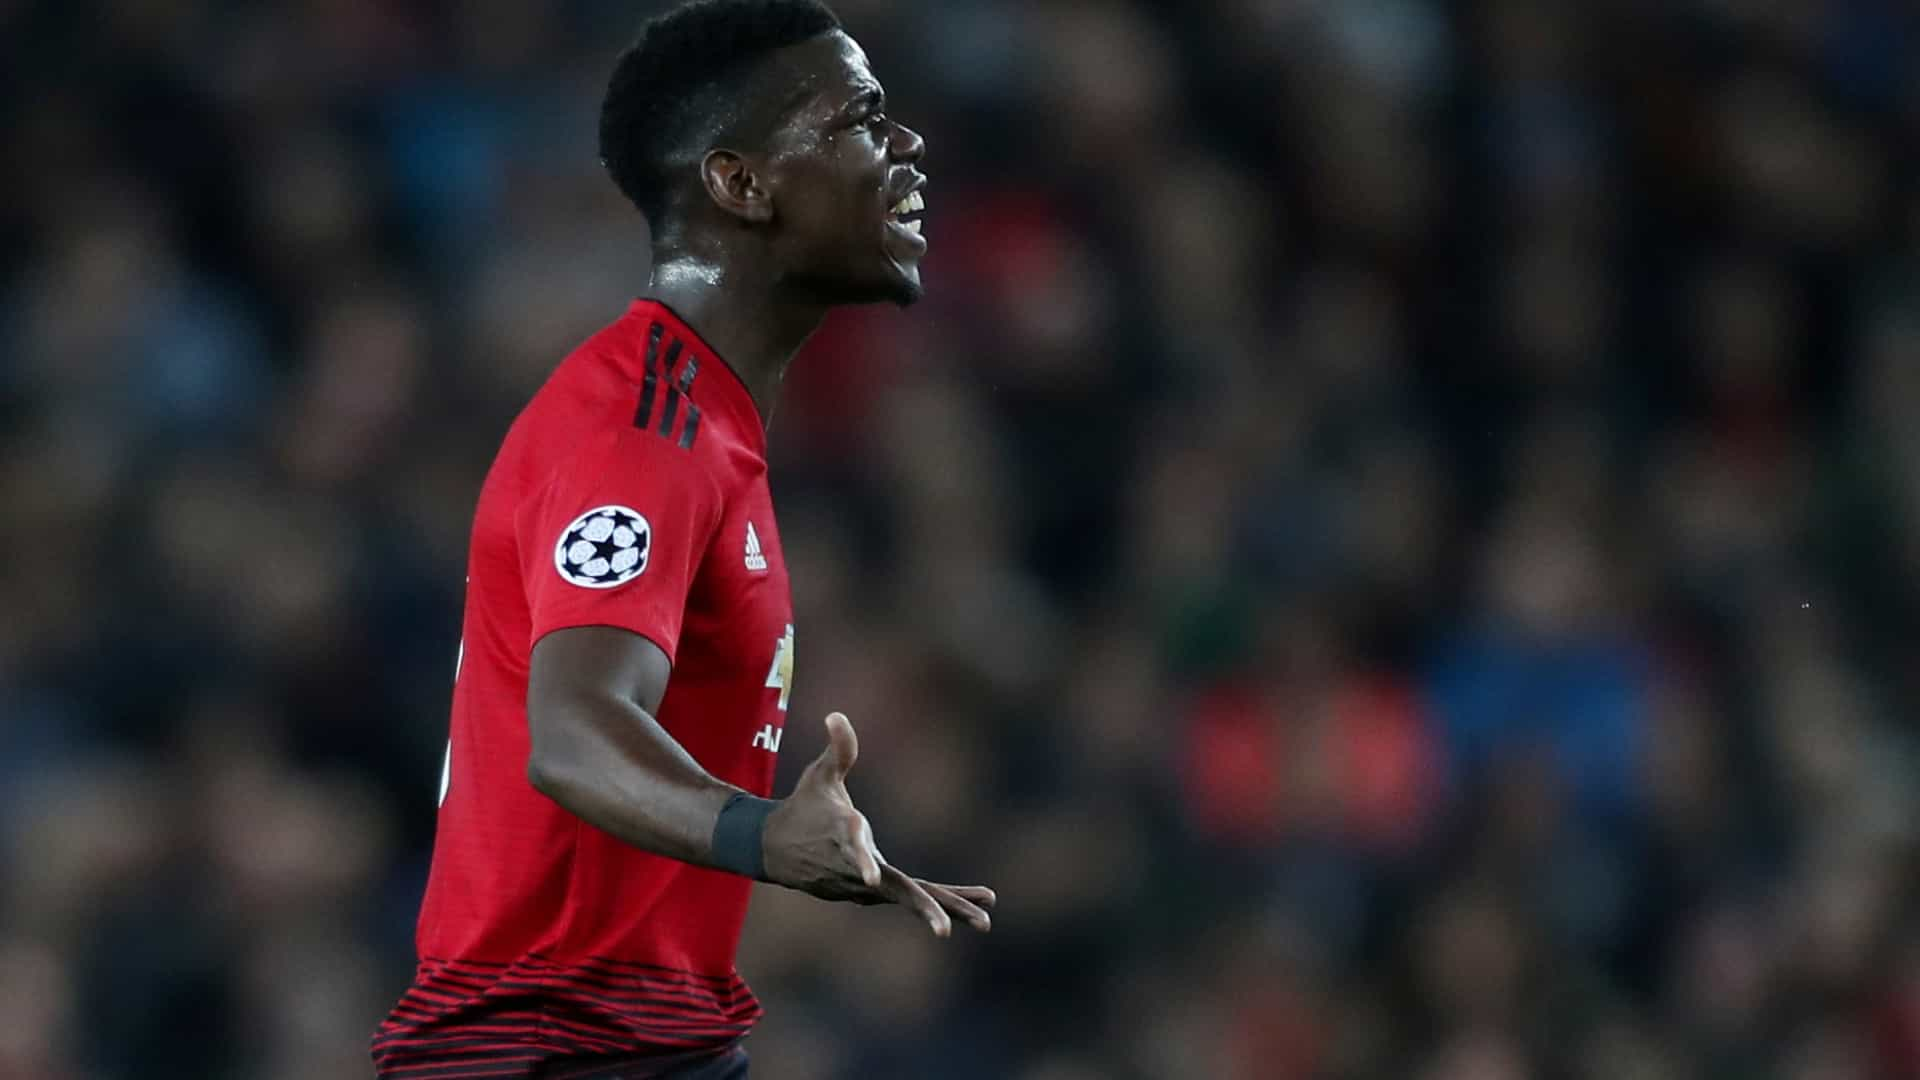 Manchester United decreta blackout a Paul Pogba